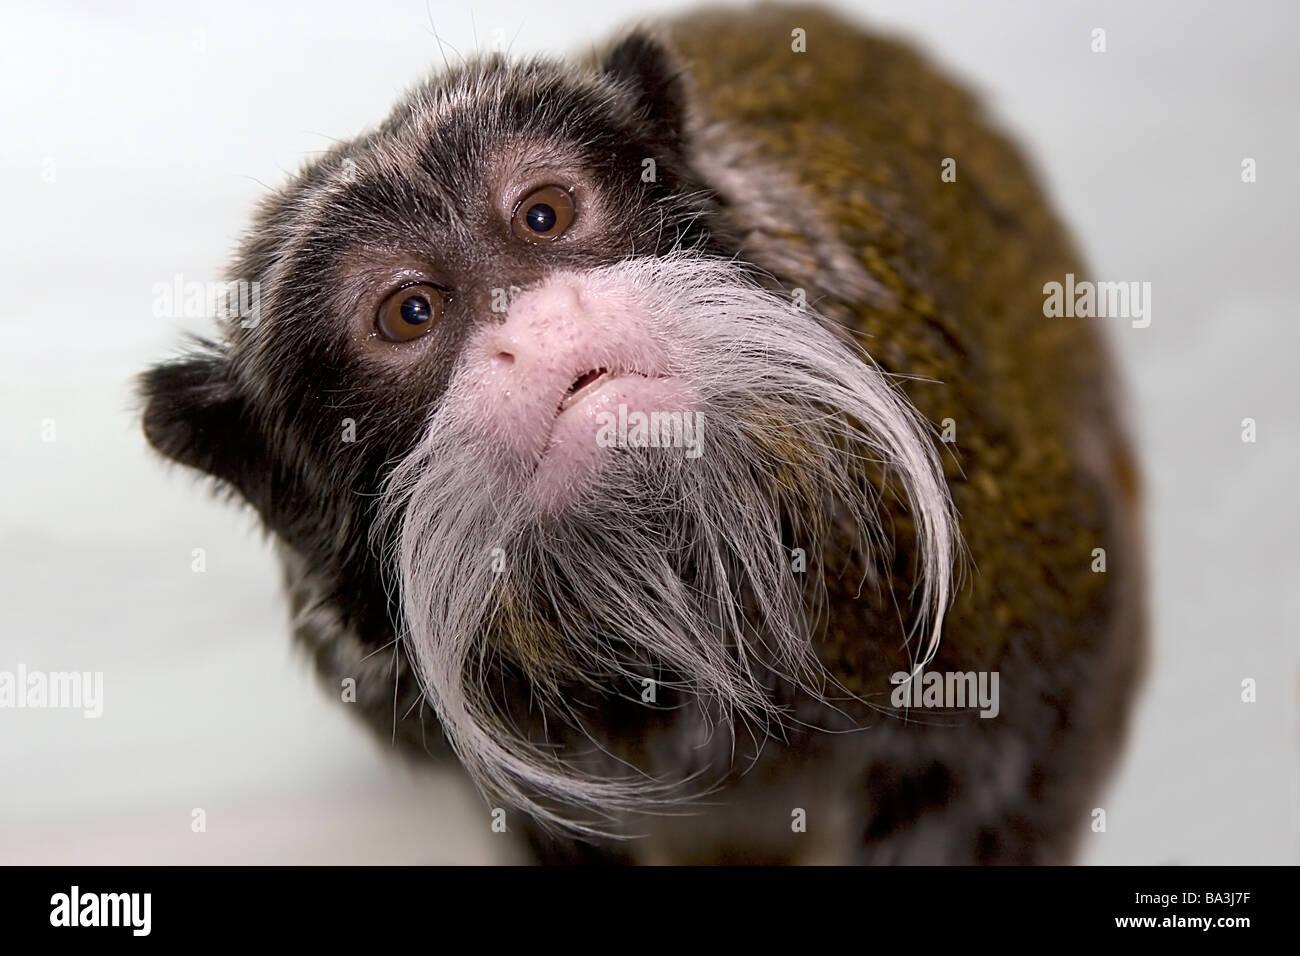 Emperor Tamarin inquisitive nosey monkey cheeky moustache Saguinus imperator - Stock Image